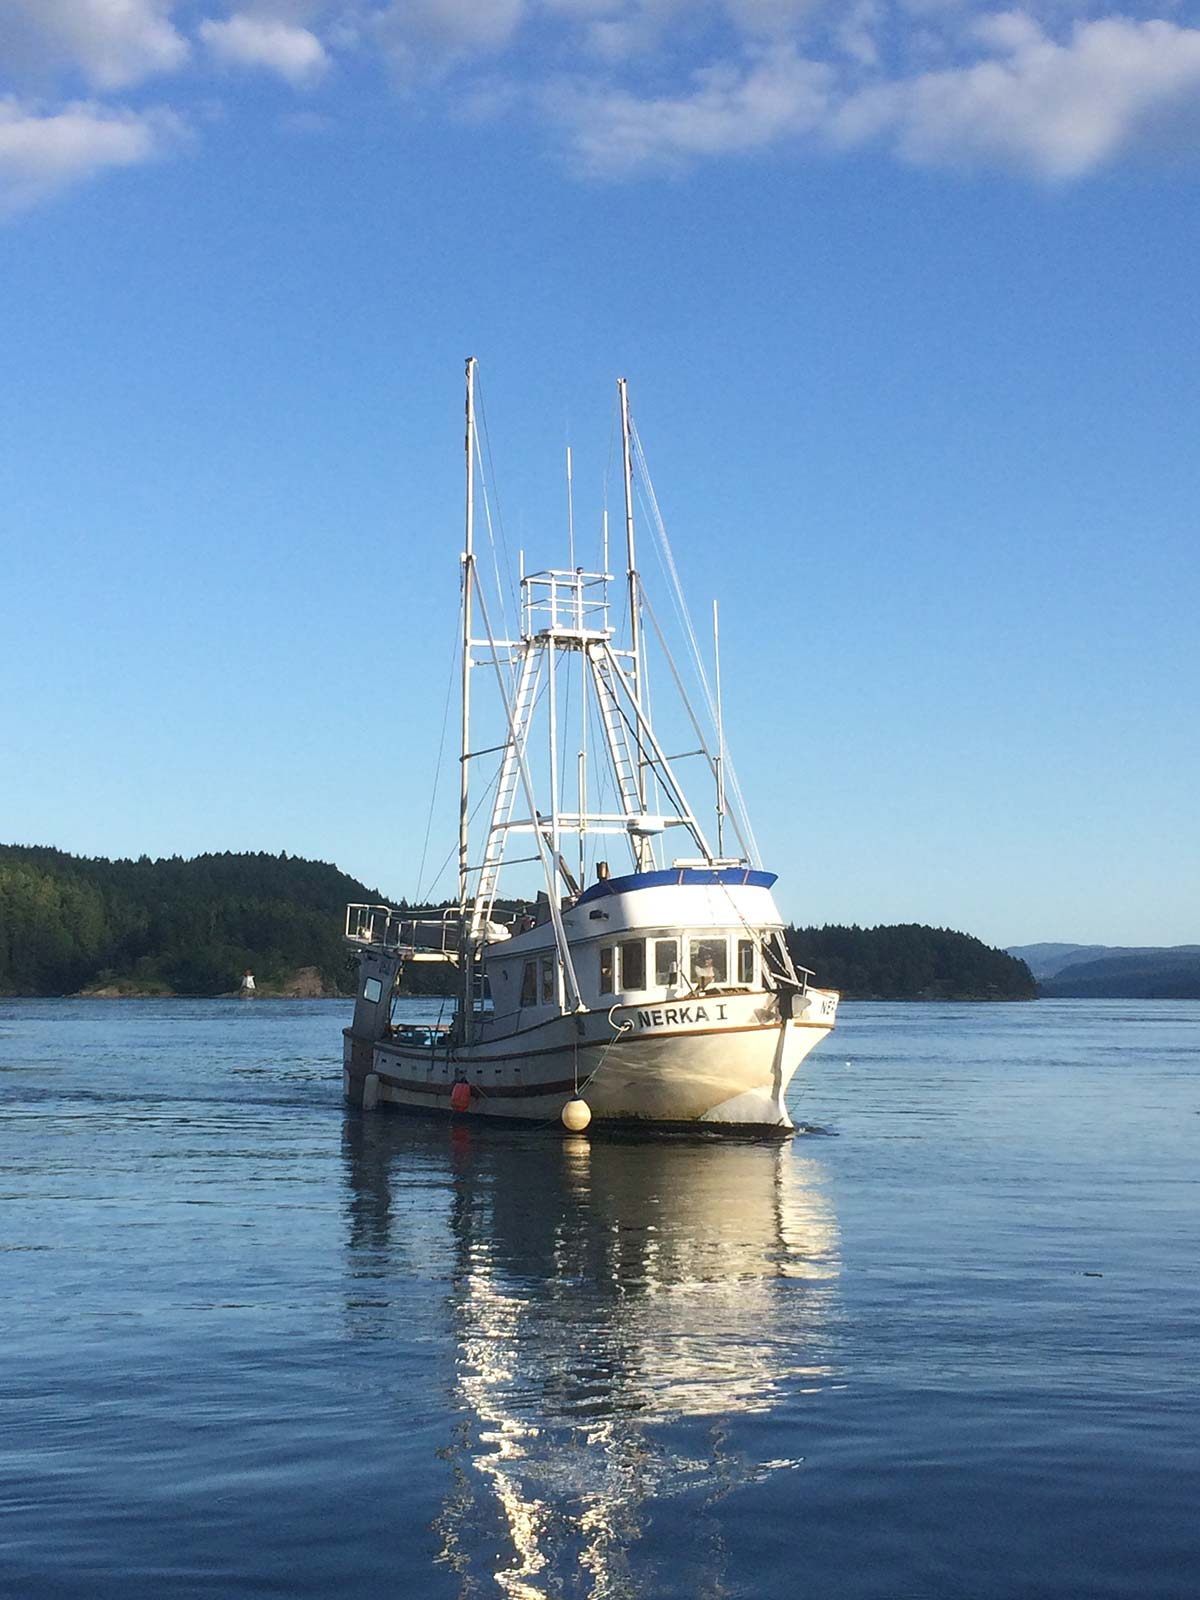 The Nerka fishing vessel